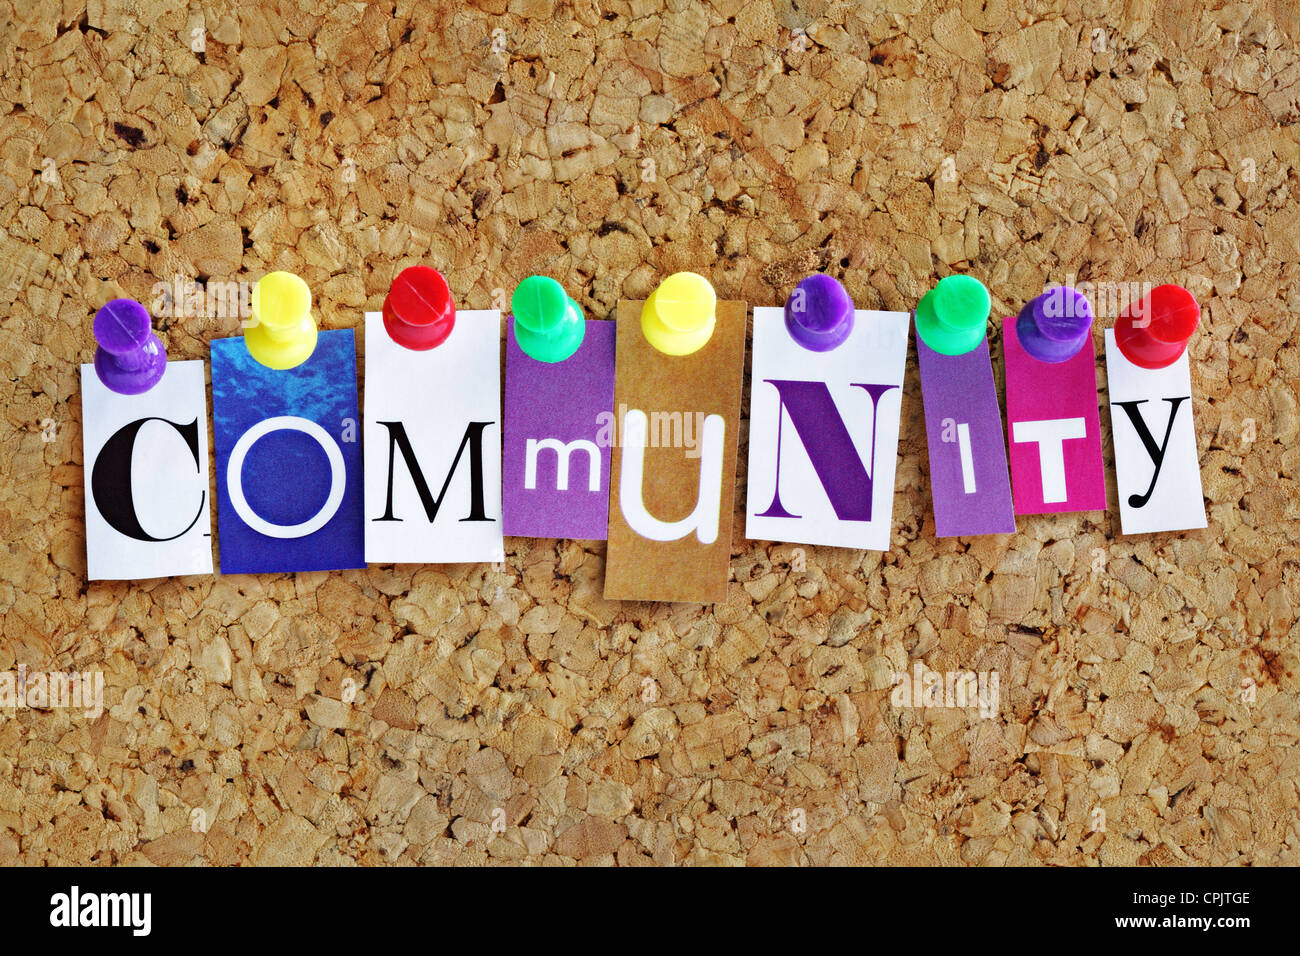 Community - Stock Image